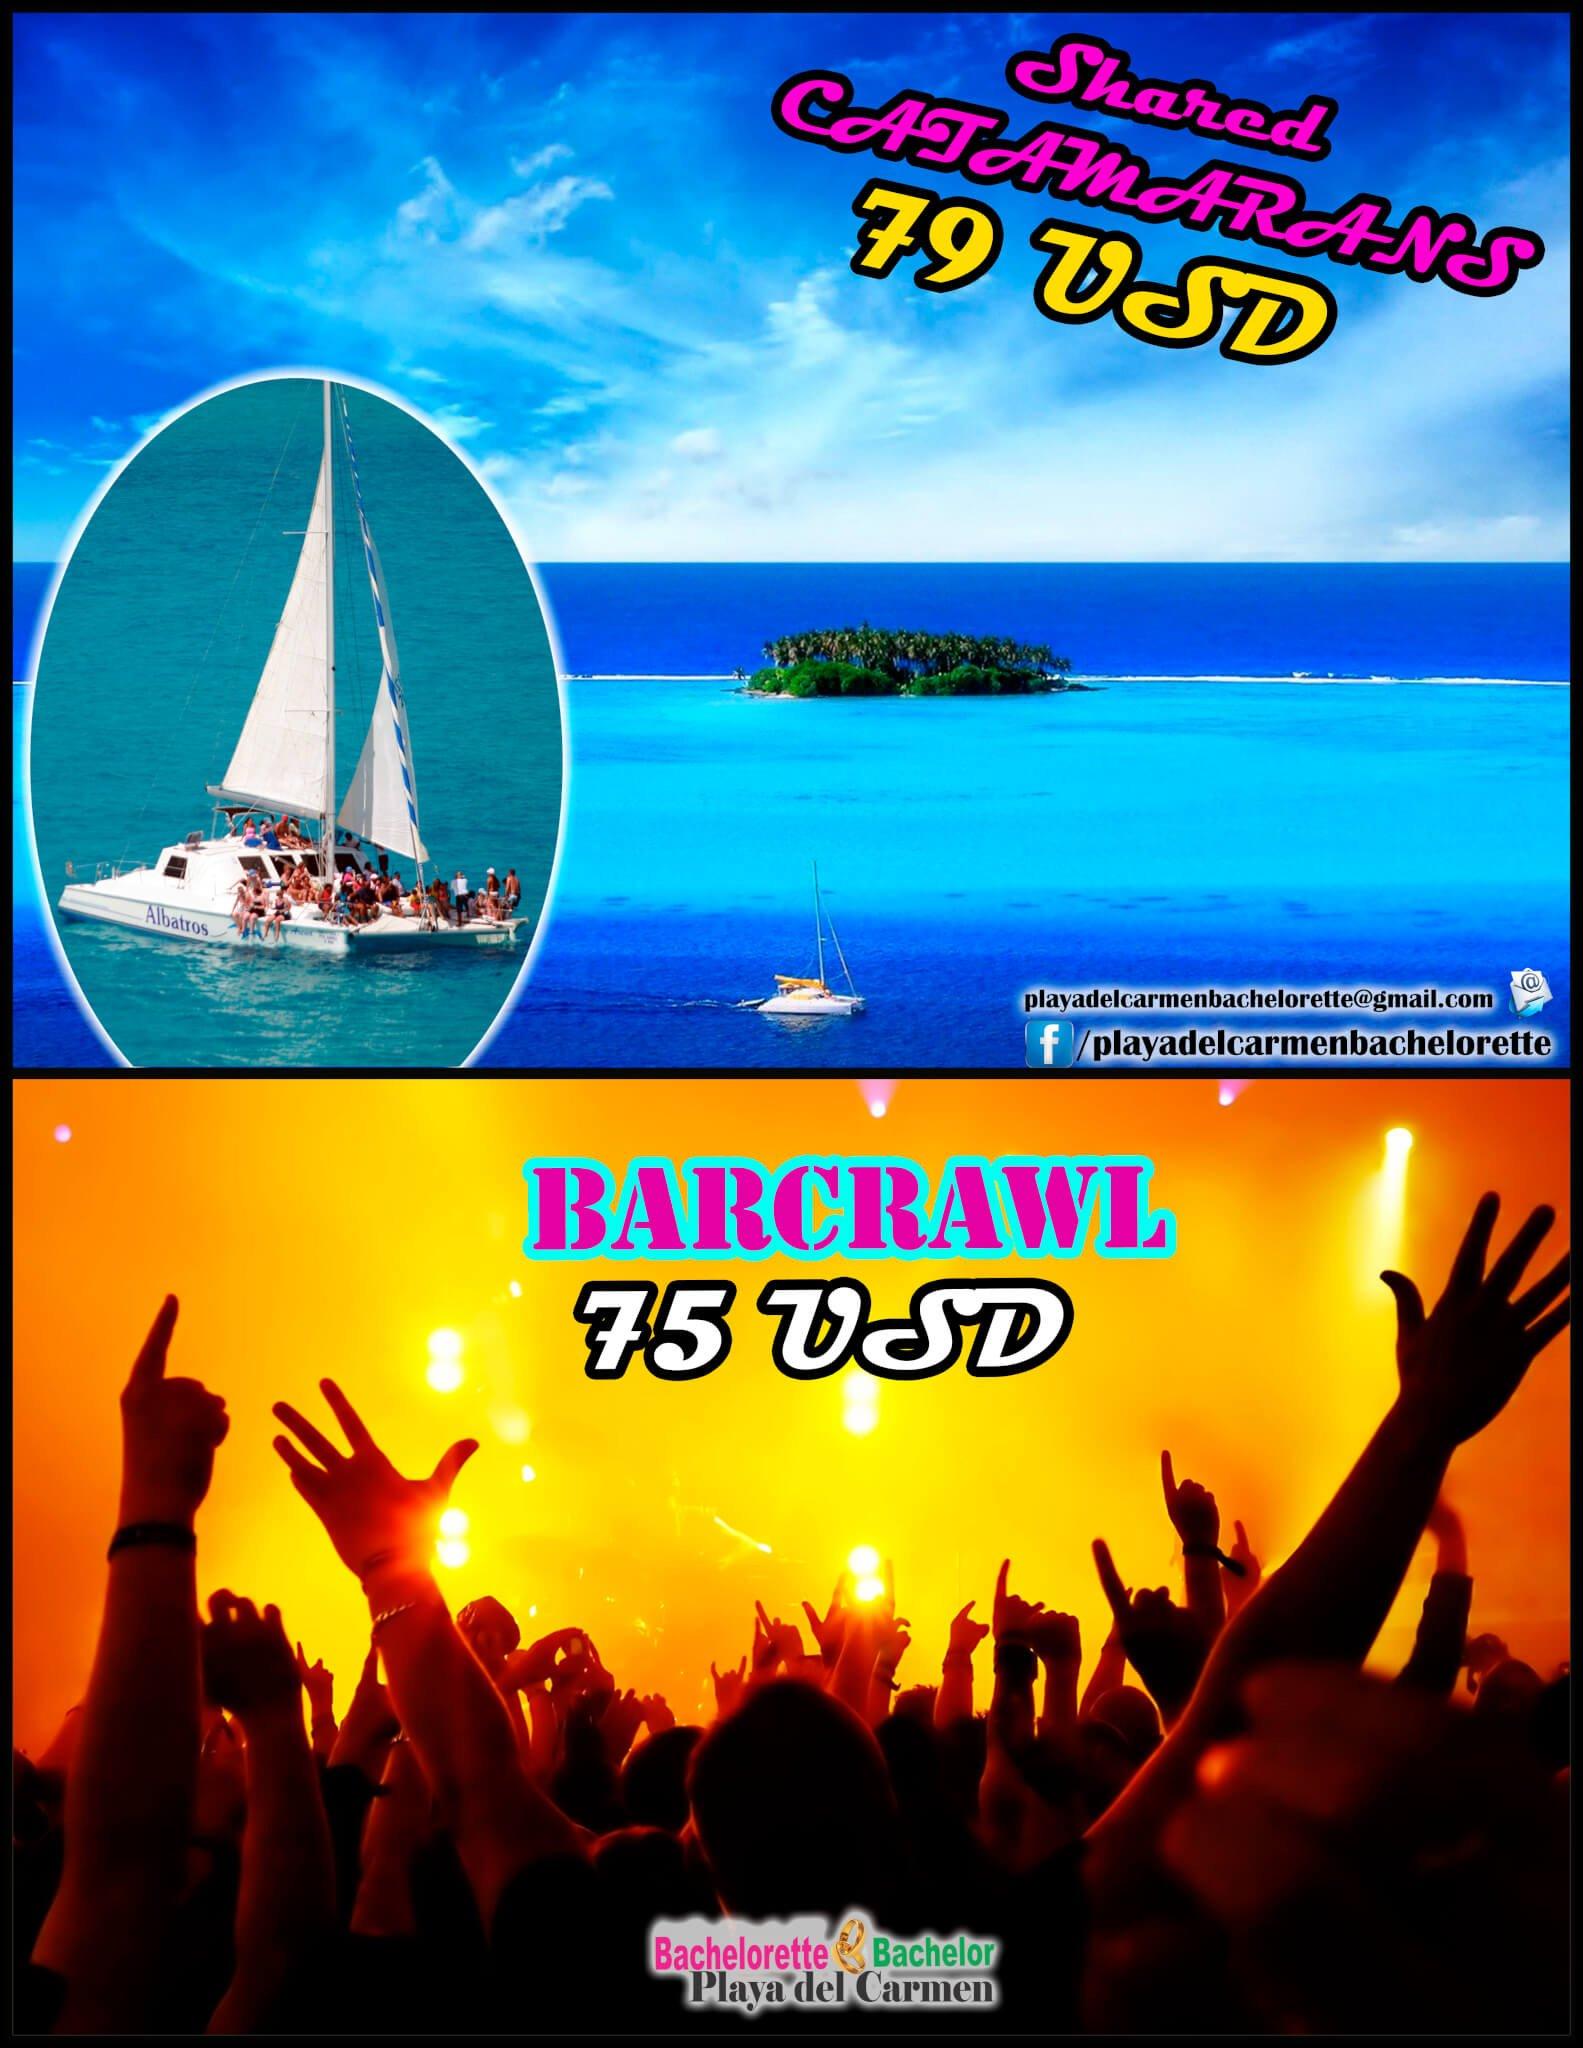 offer barcraw + catamaran